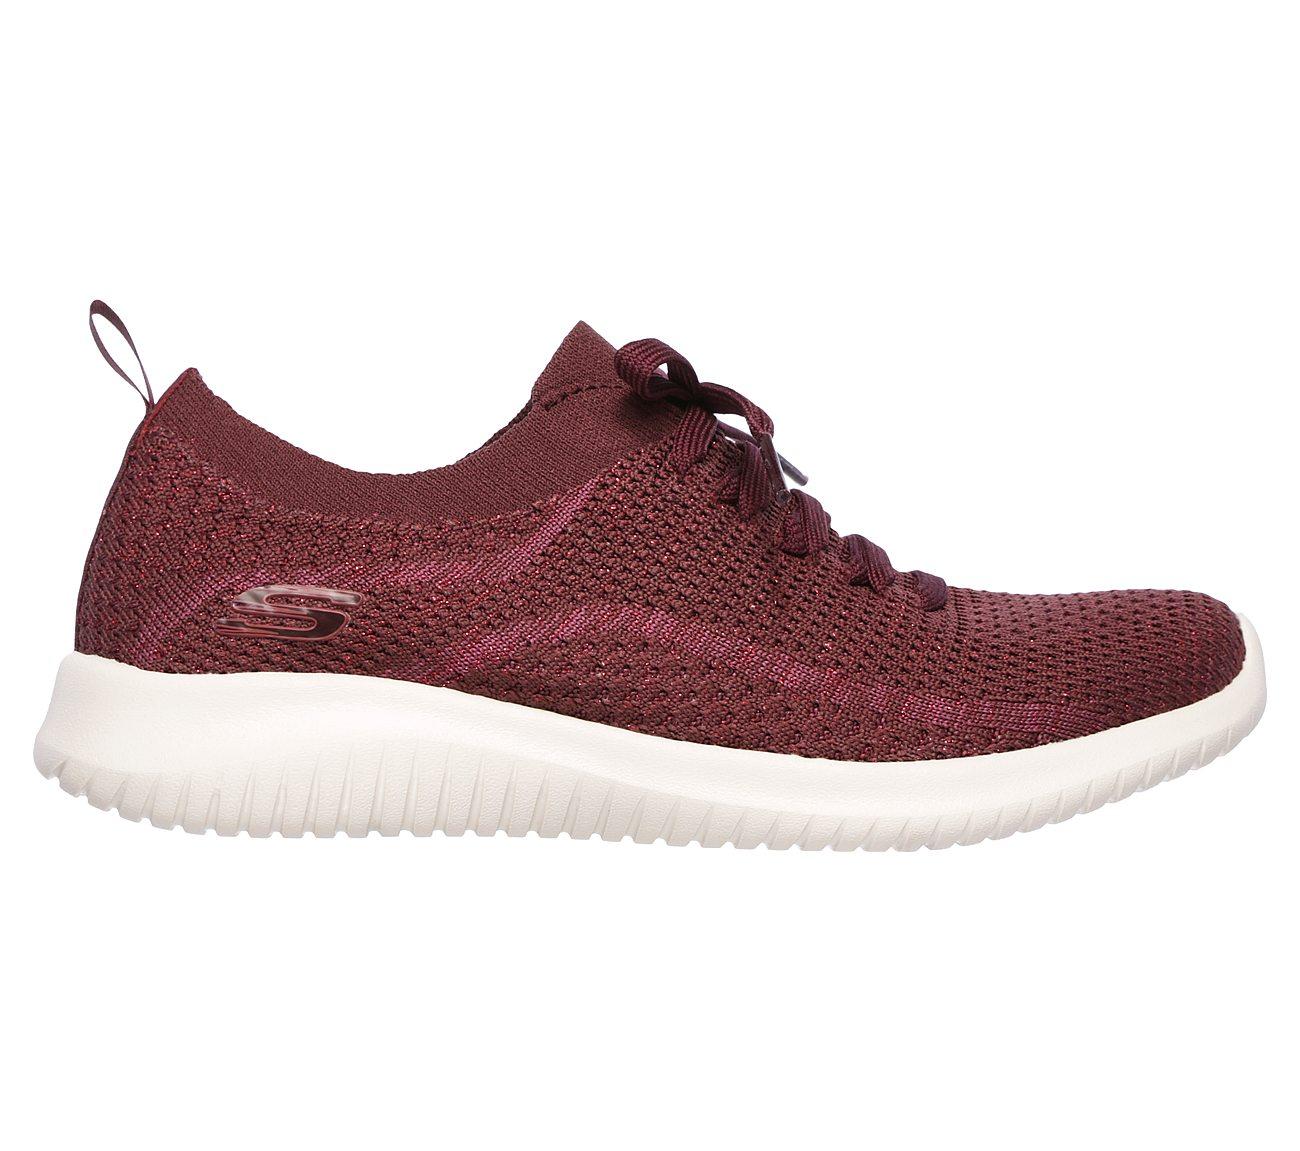 d460b2401b78a Buy SKECHERS Ultra Flex Sport Shoes only $65.00